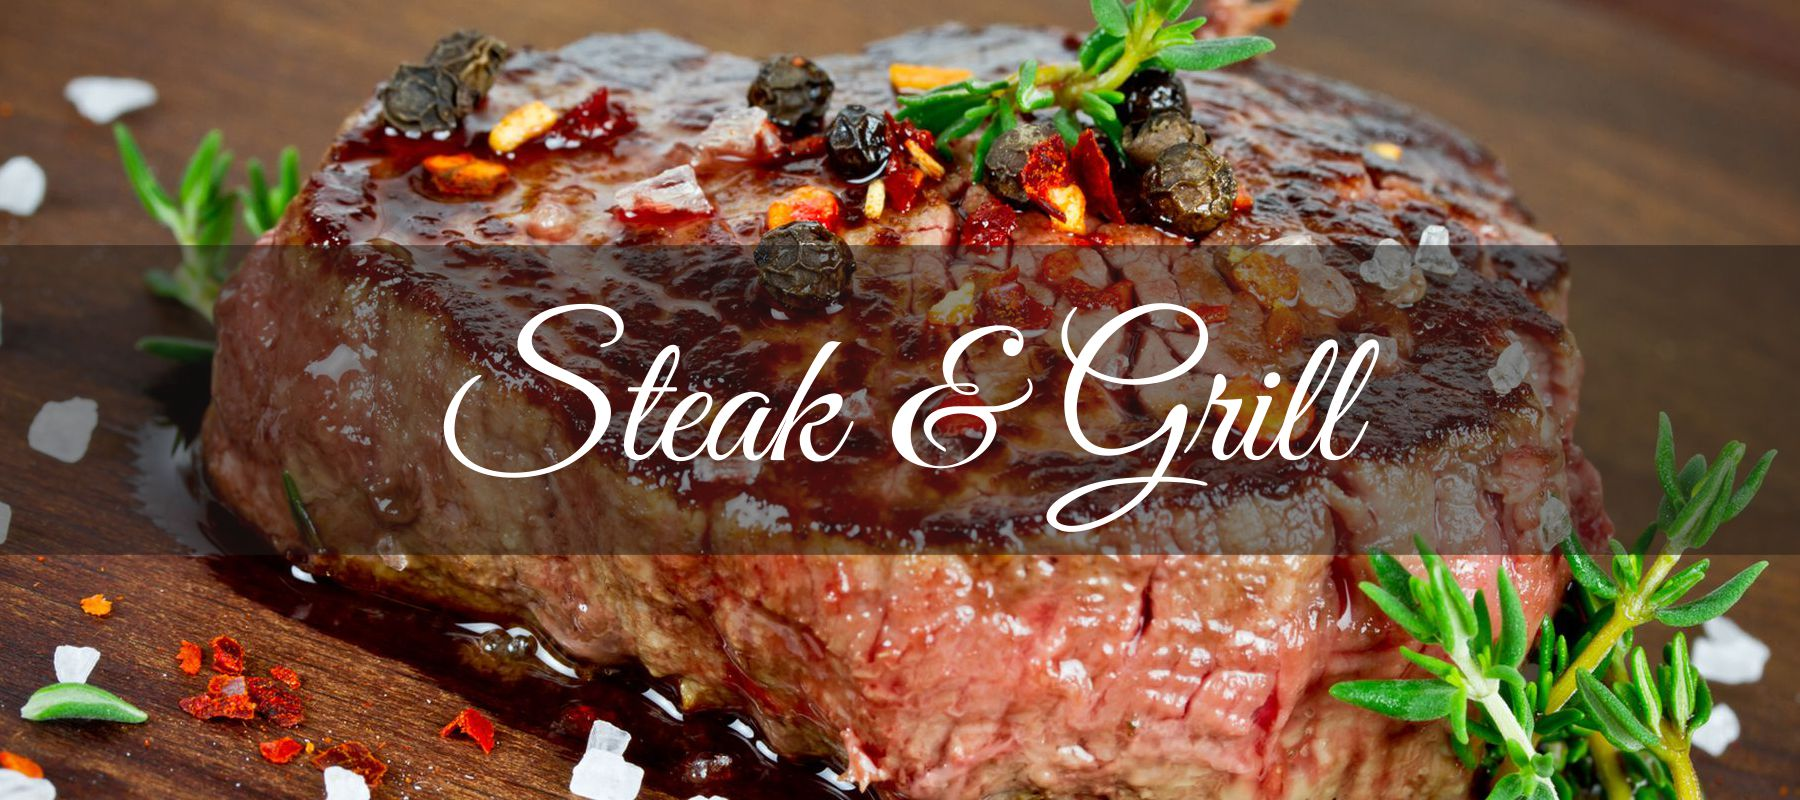 Steak & Grill